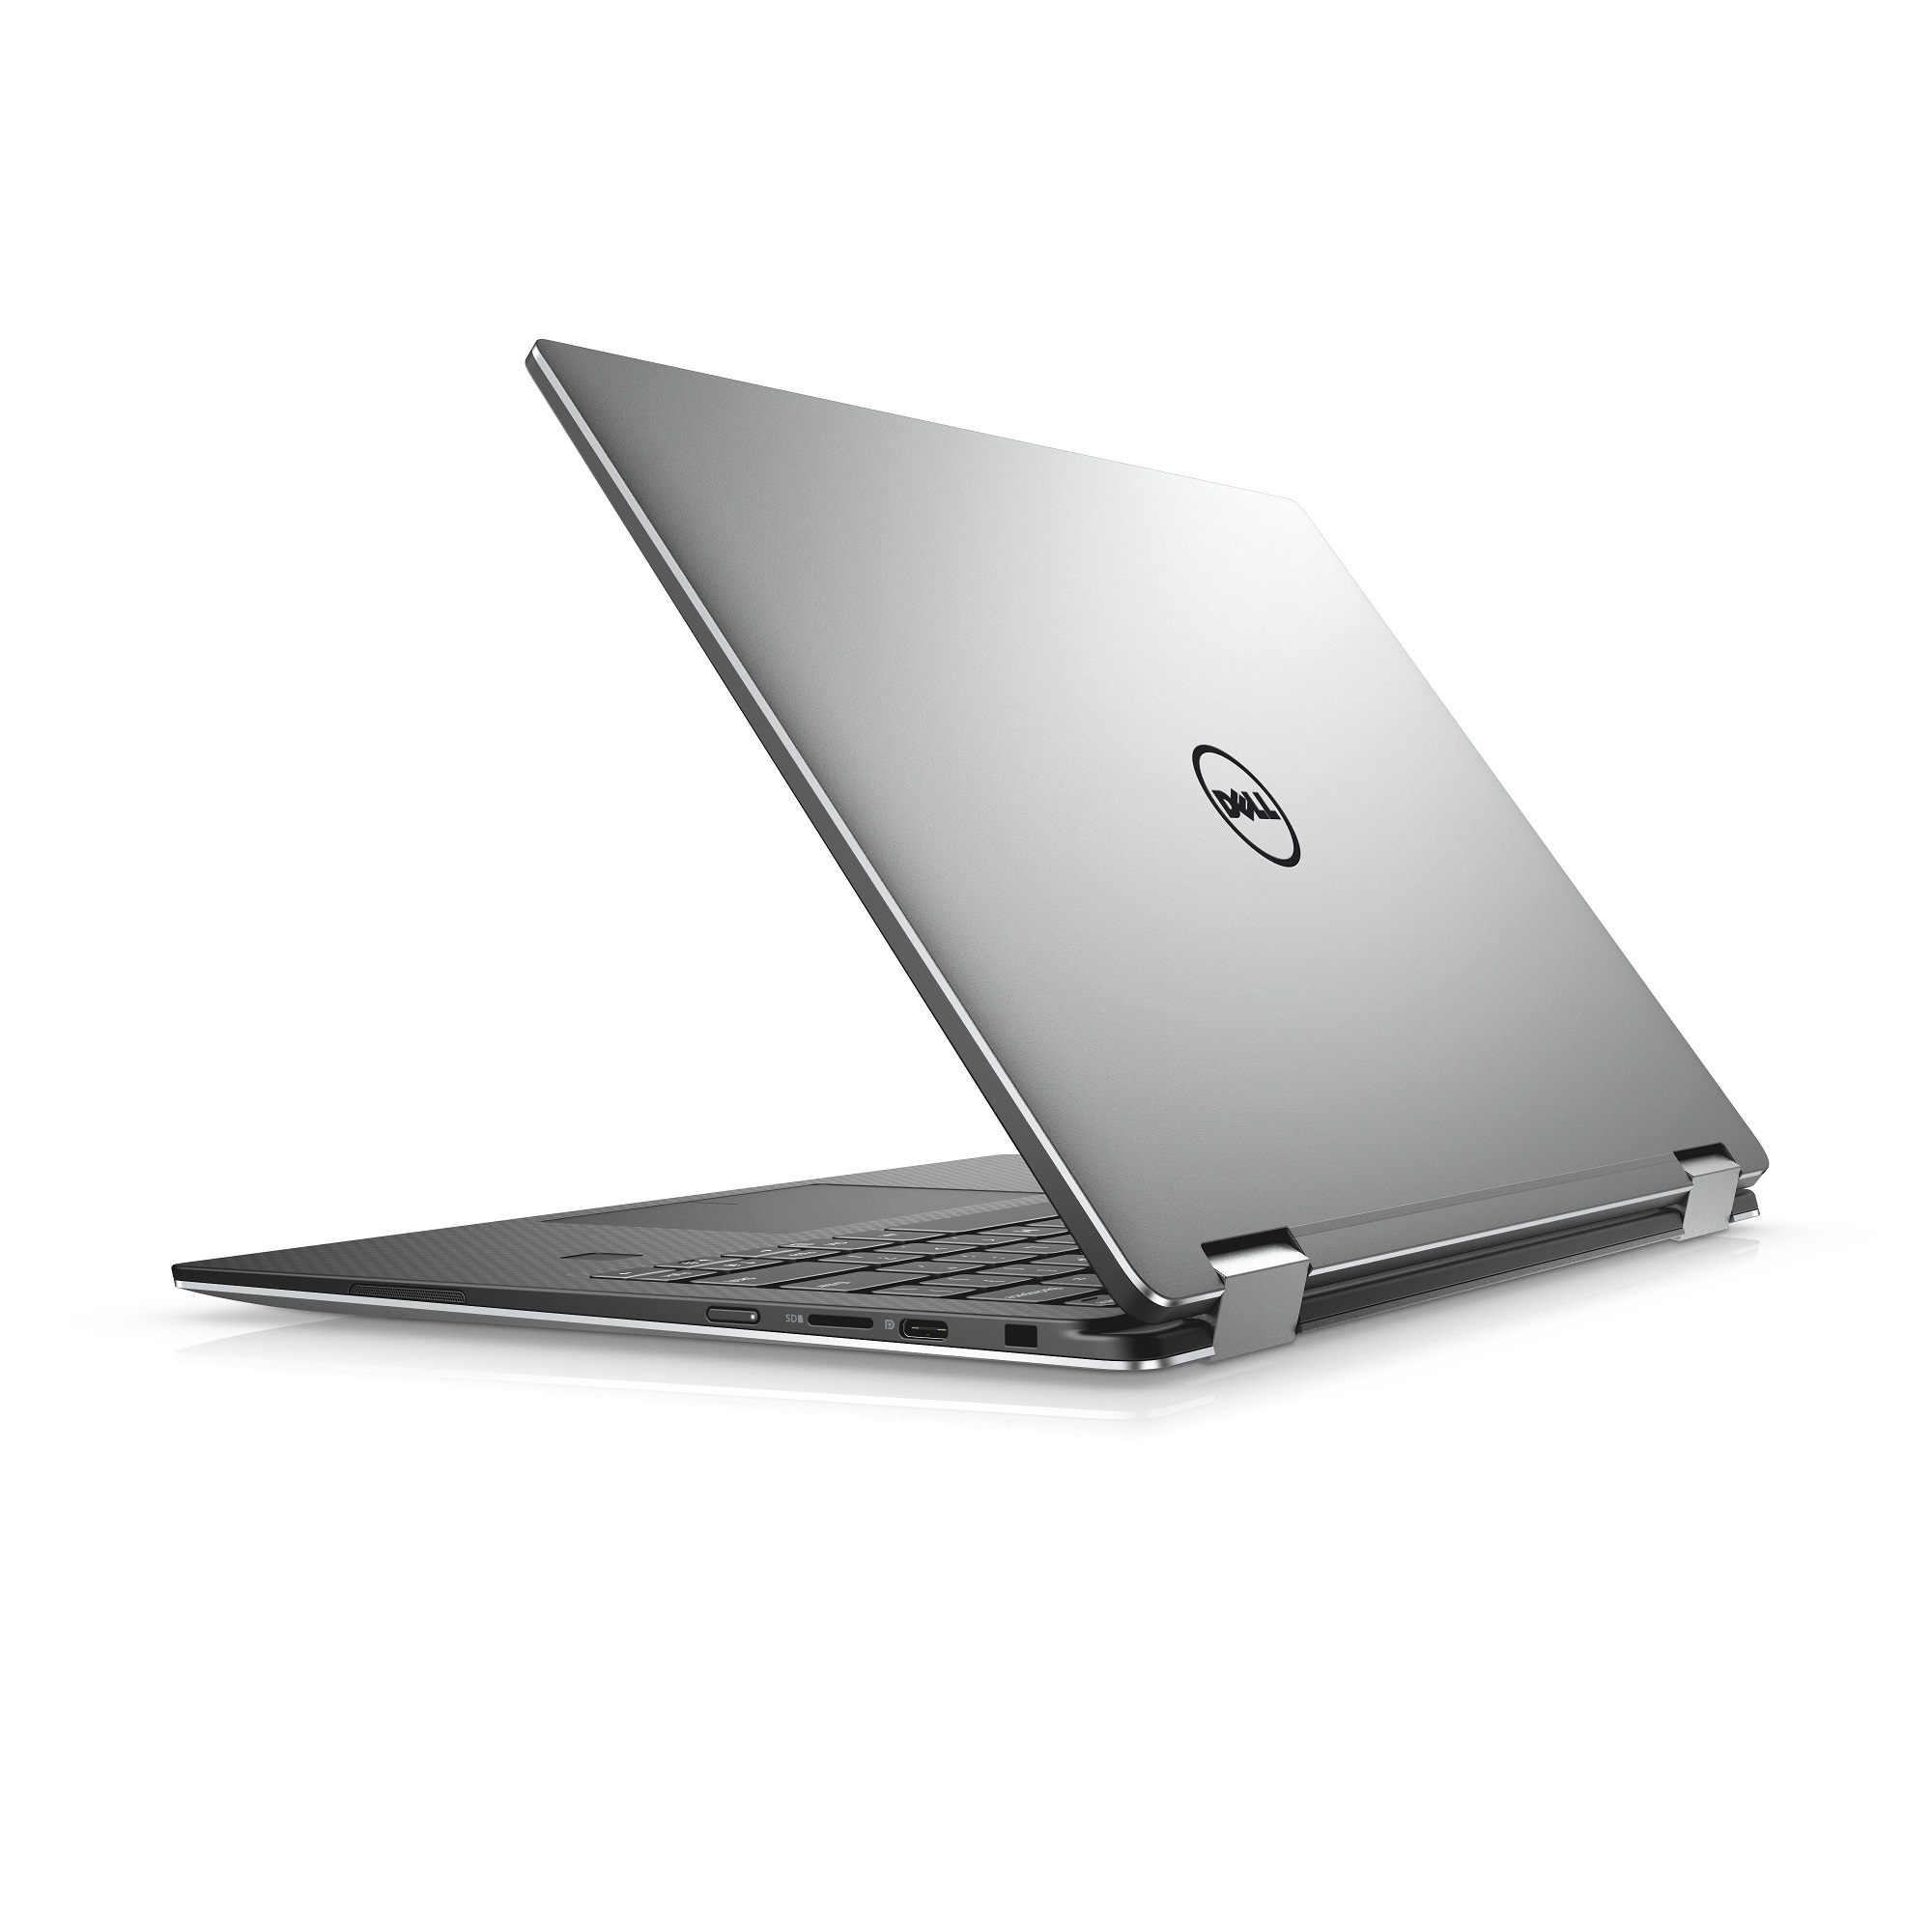 "DELL Ultrabook XPS 13 (9365)/i7-7Y75/8GB/512GB SSD/Intel HD 615/13.3"" QHD+ Touch/Win 10 PRO/Silver"